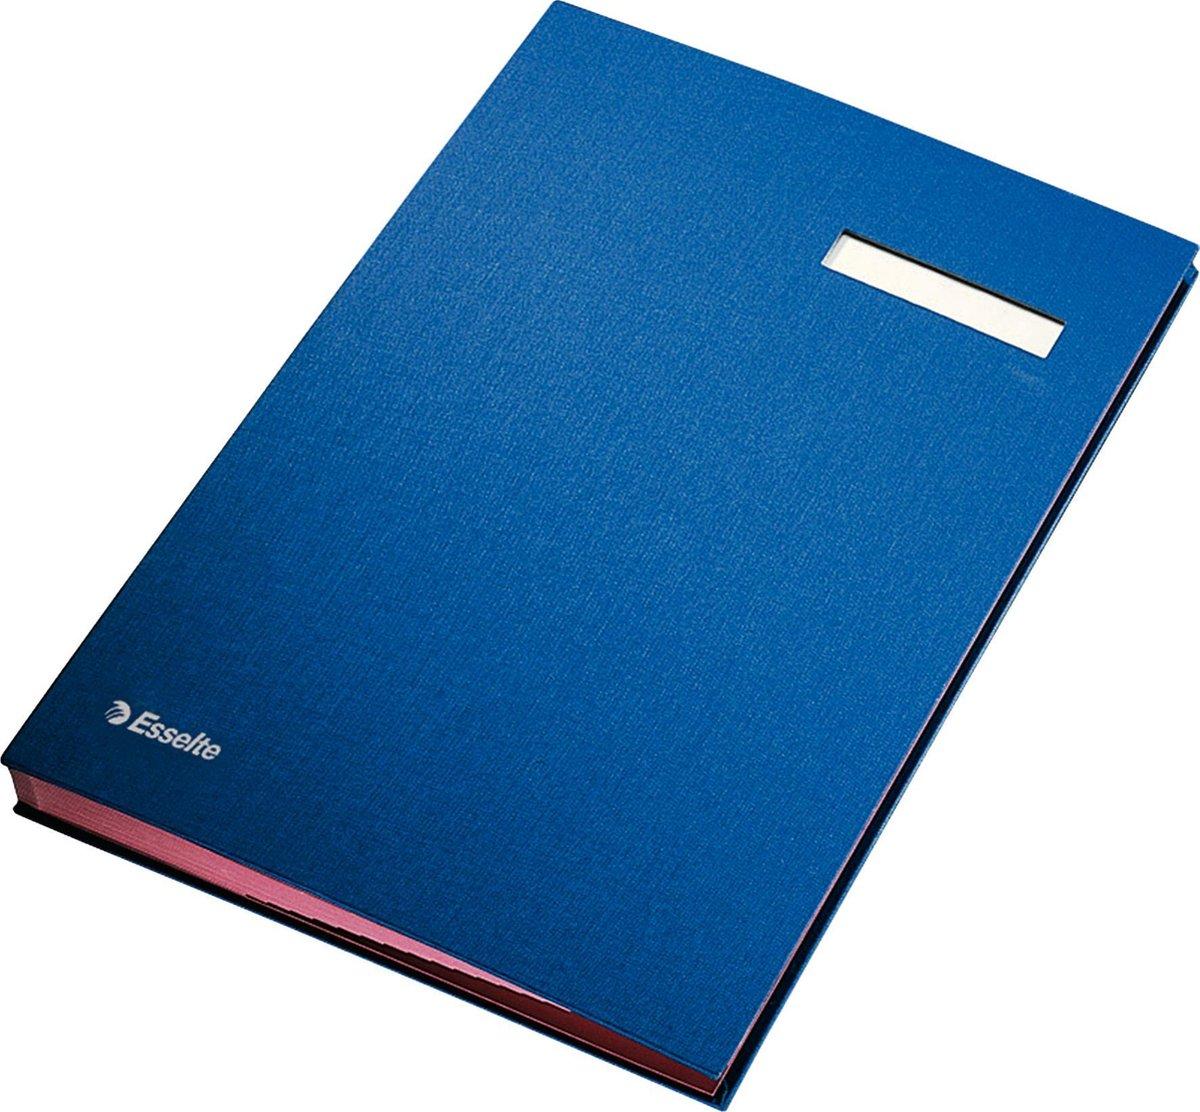 Esselte Vloeiboek Karton - Blauw